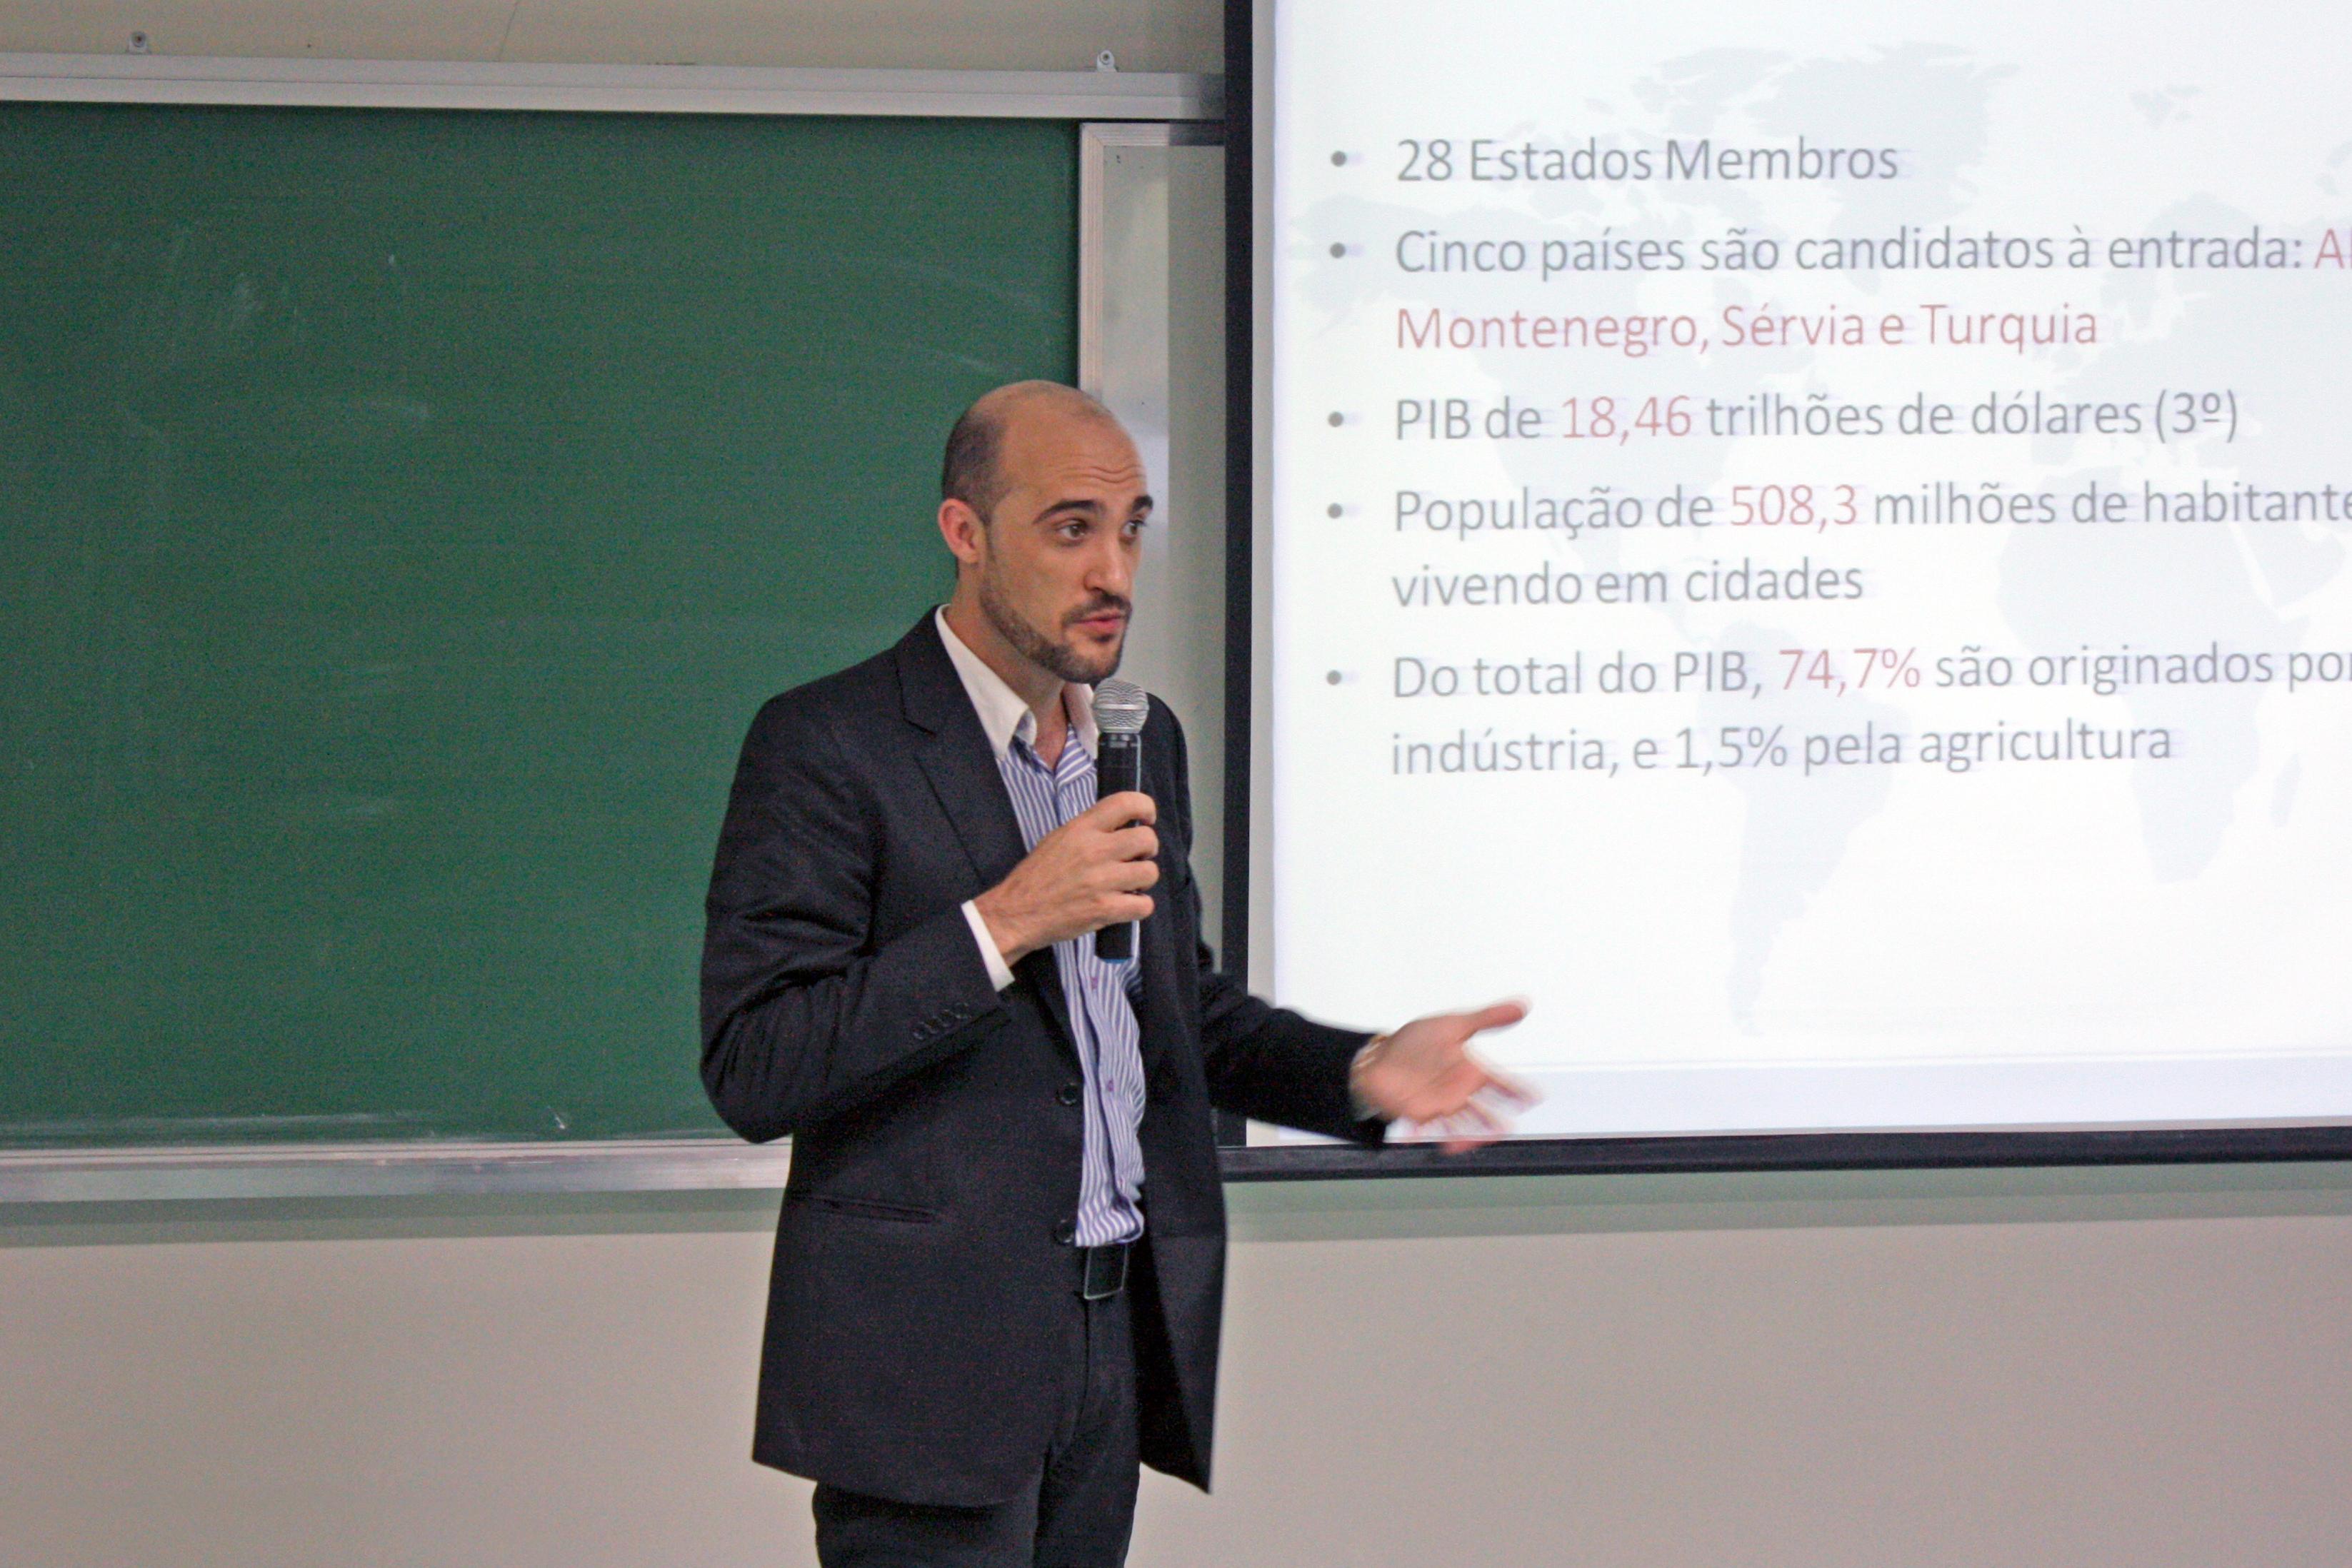 Cleonir Tumelero falou sobre a União Europeia